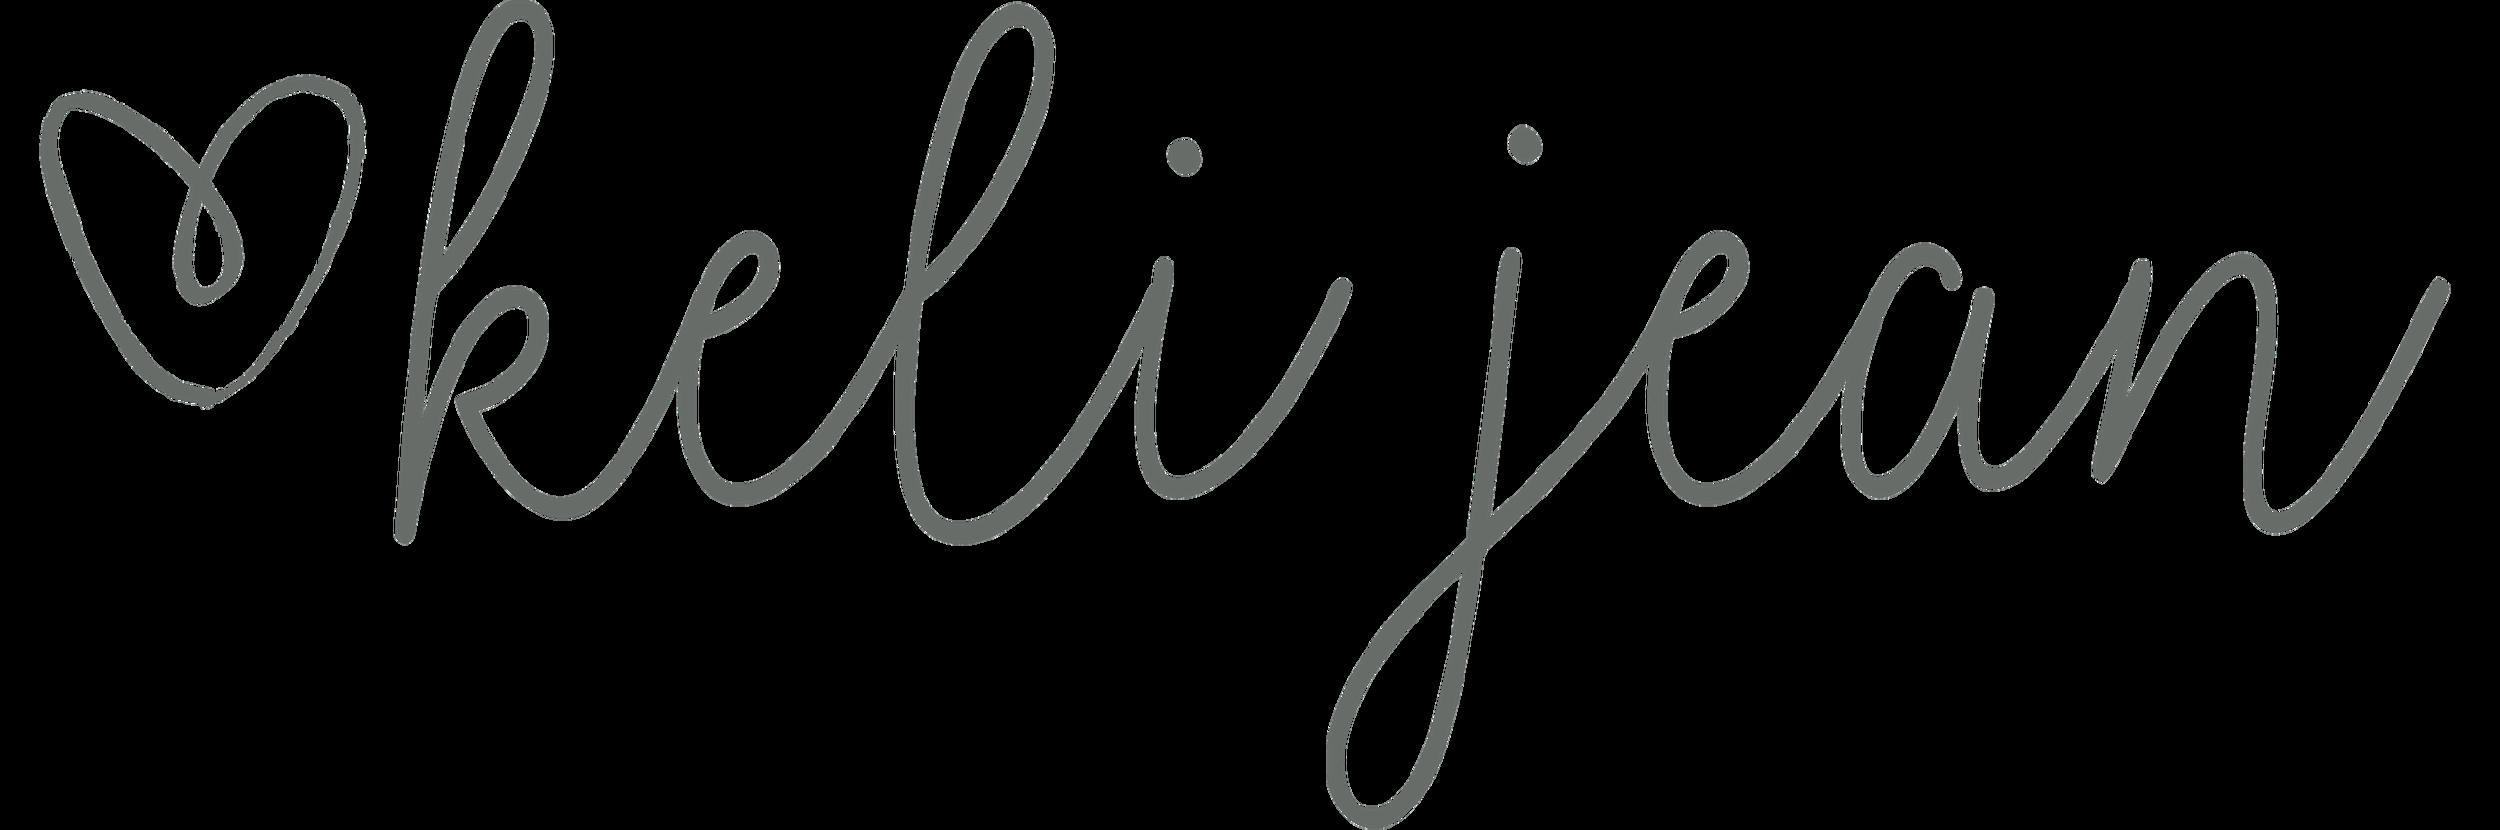 Keli Jean signature (1).png